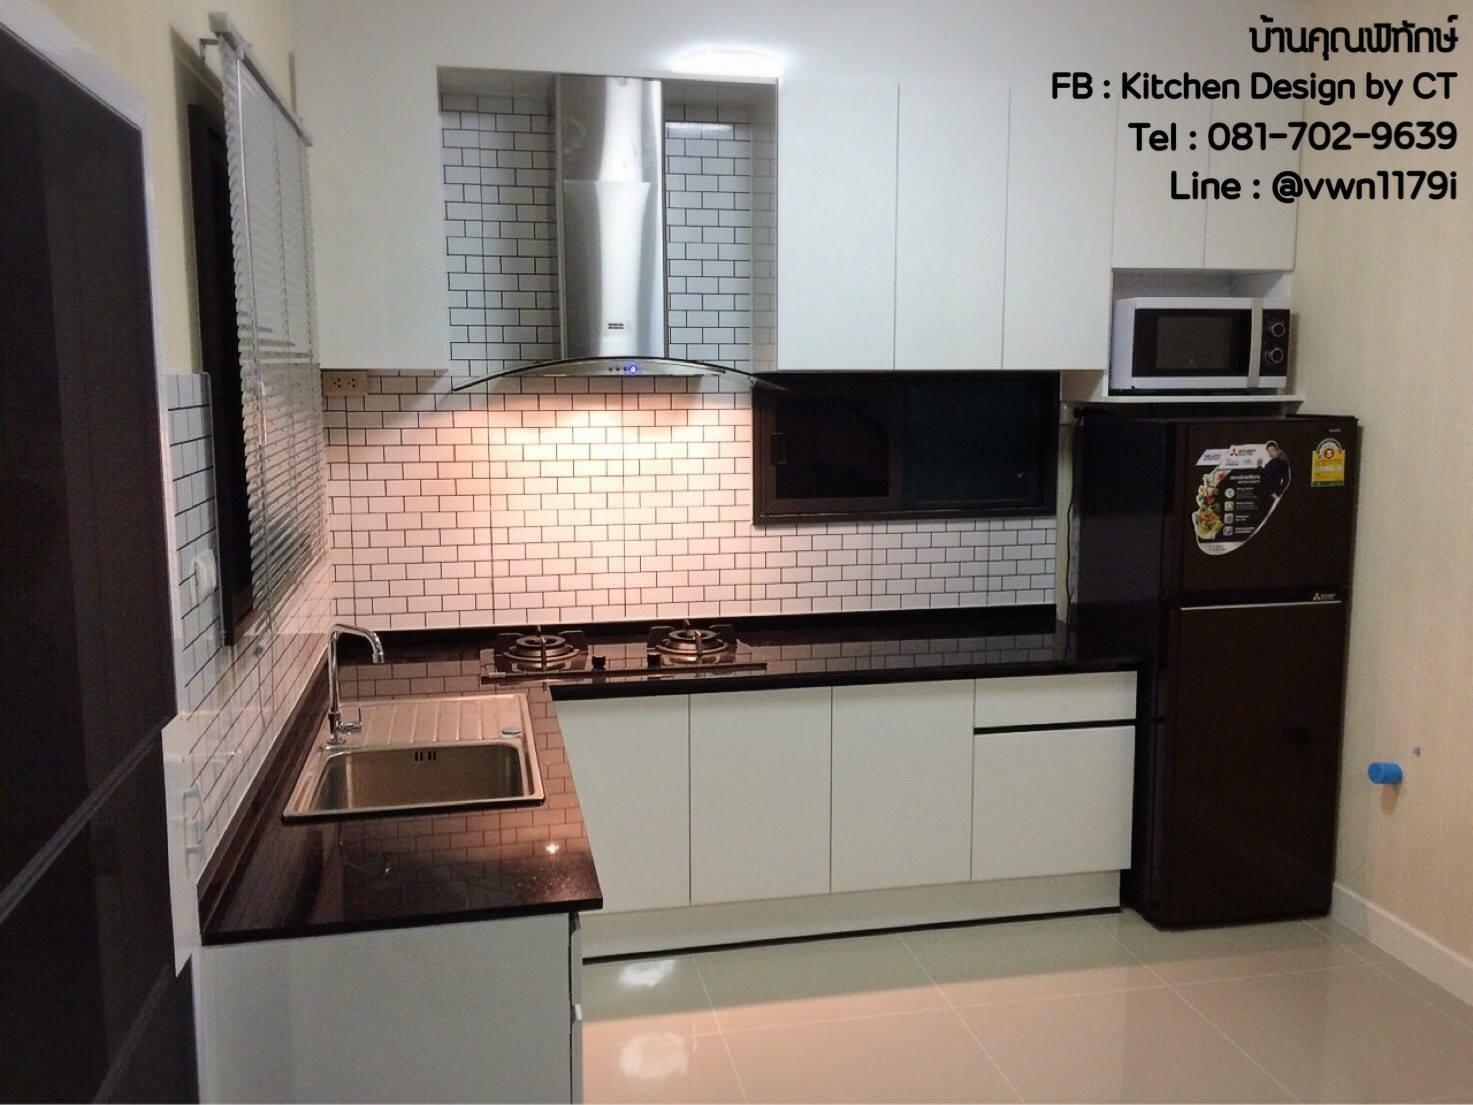 Modern White Kitchen (ครัวบิ้วอินสีขาวเงาสไตล์โมเดิร์น)